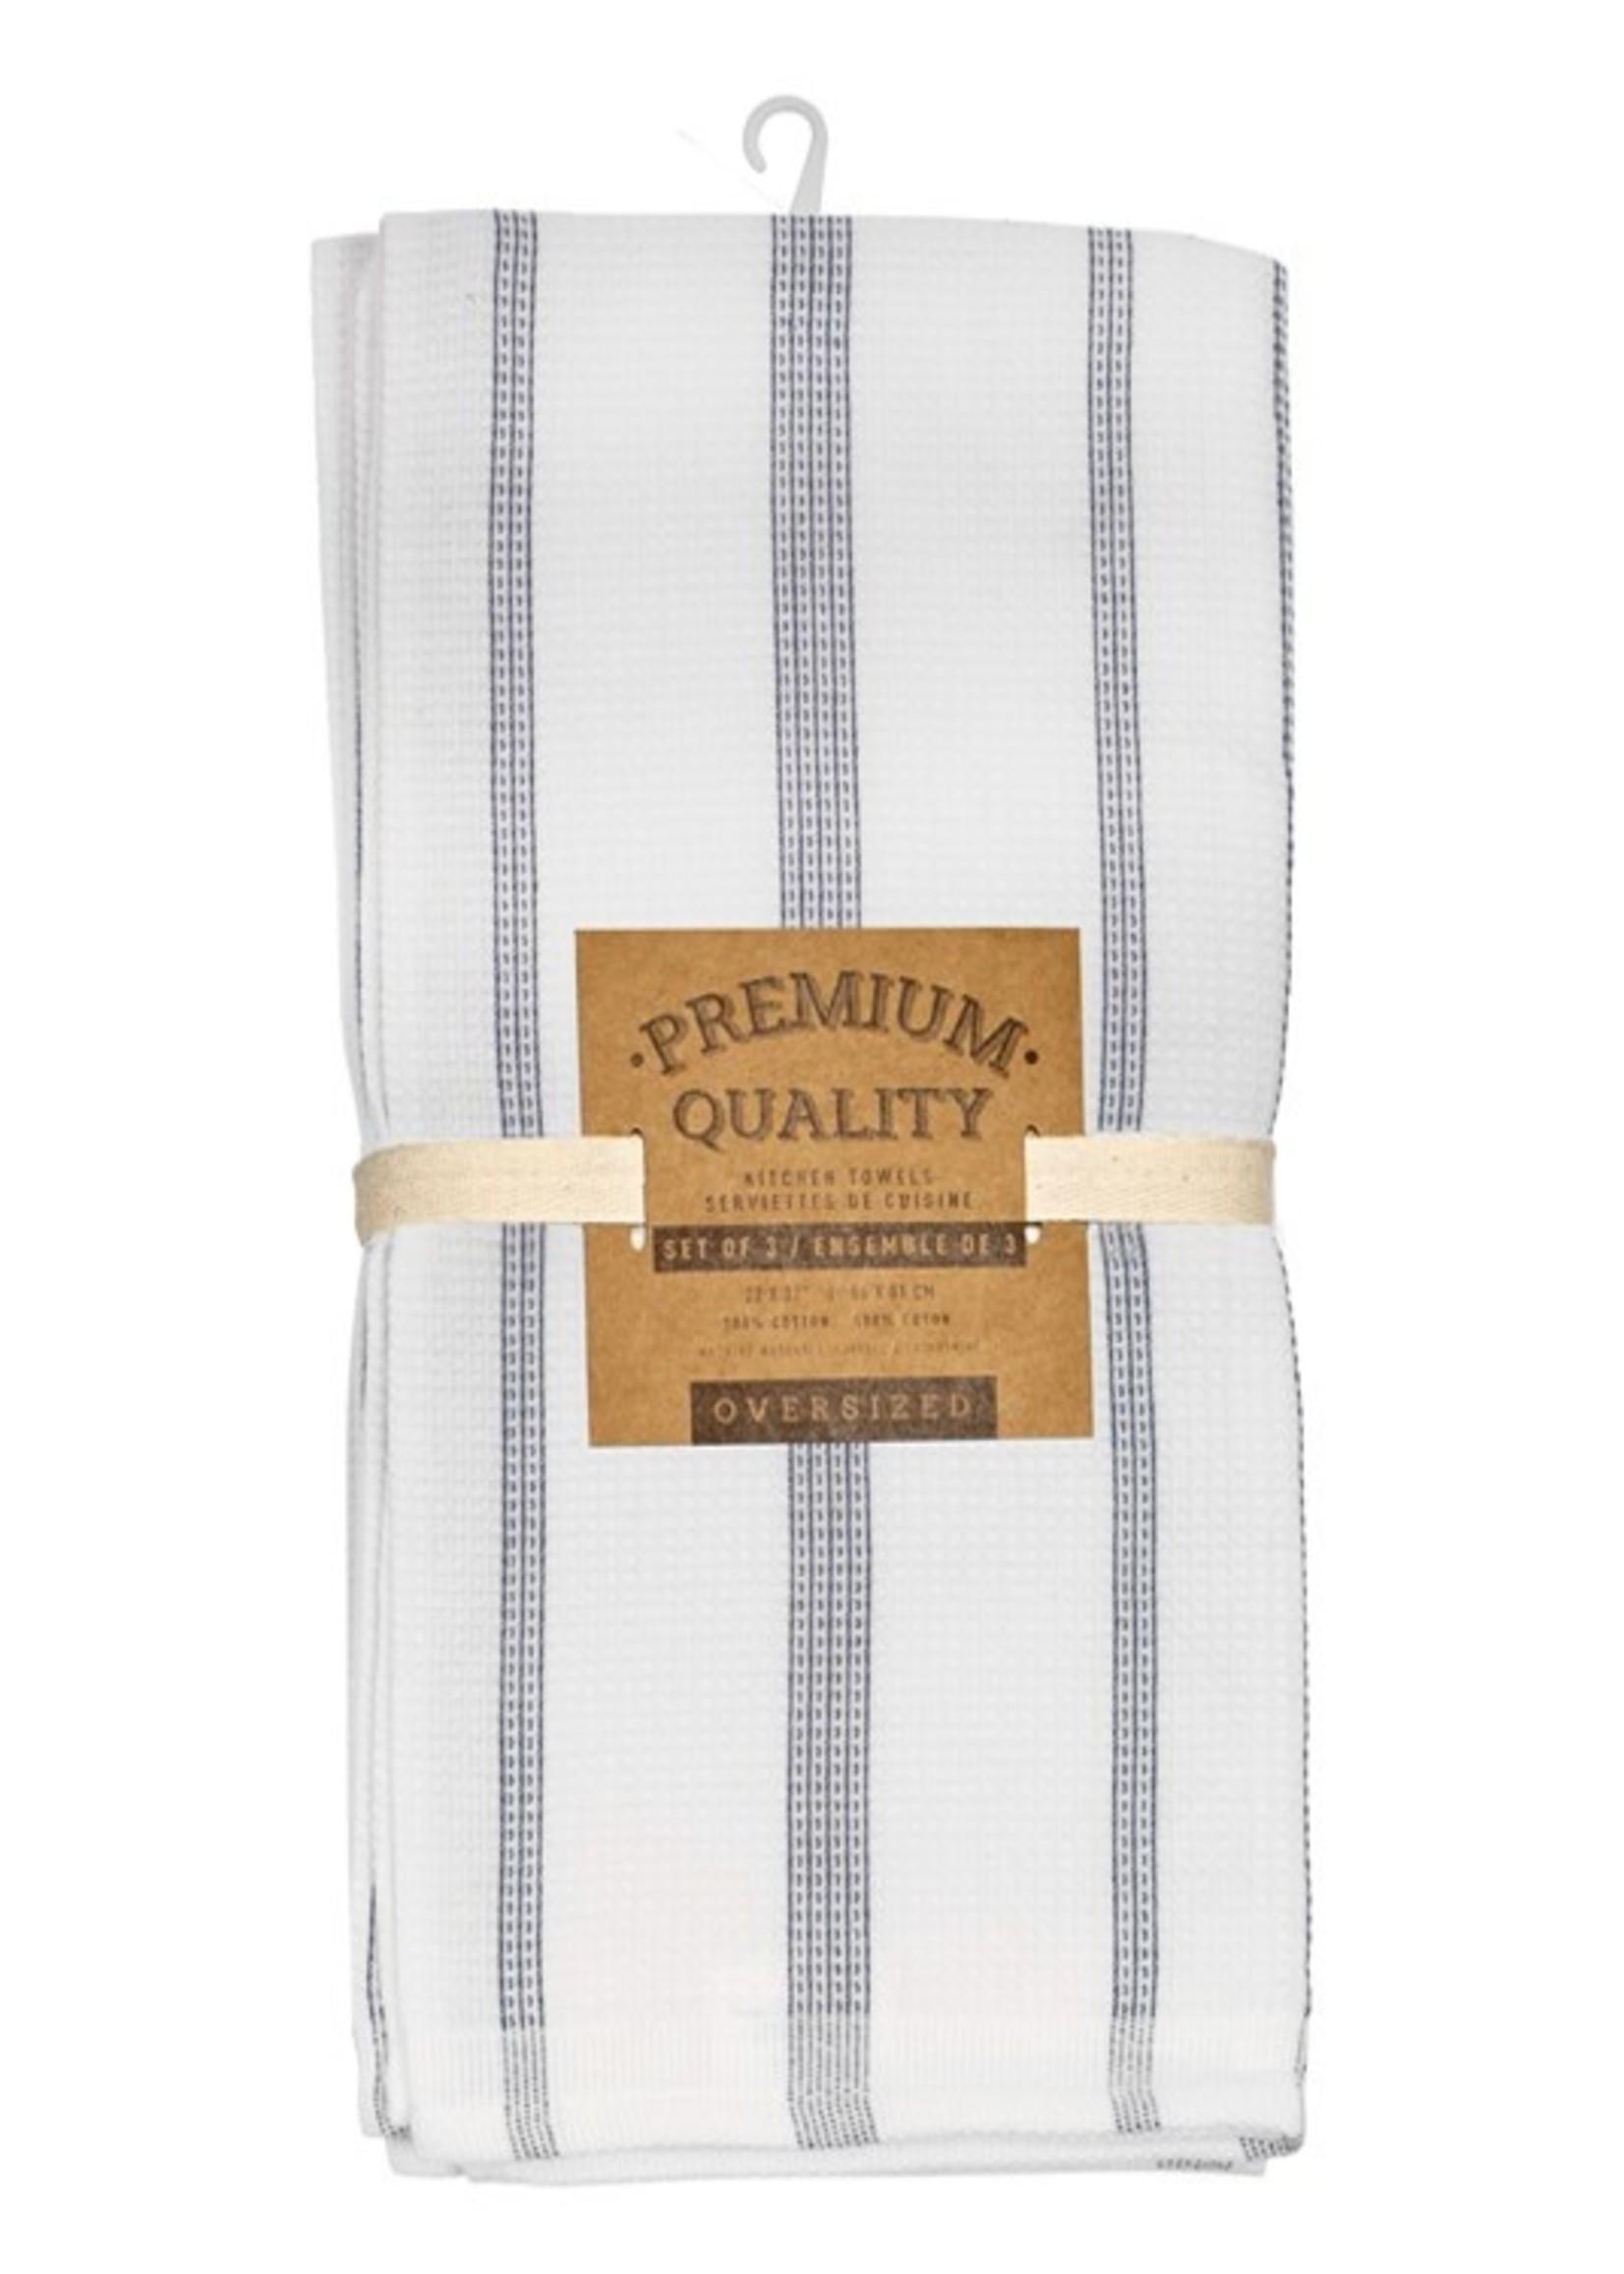 Harman Premium kitchen towel navy pinstripe